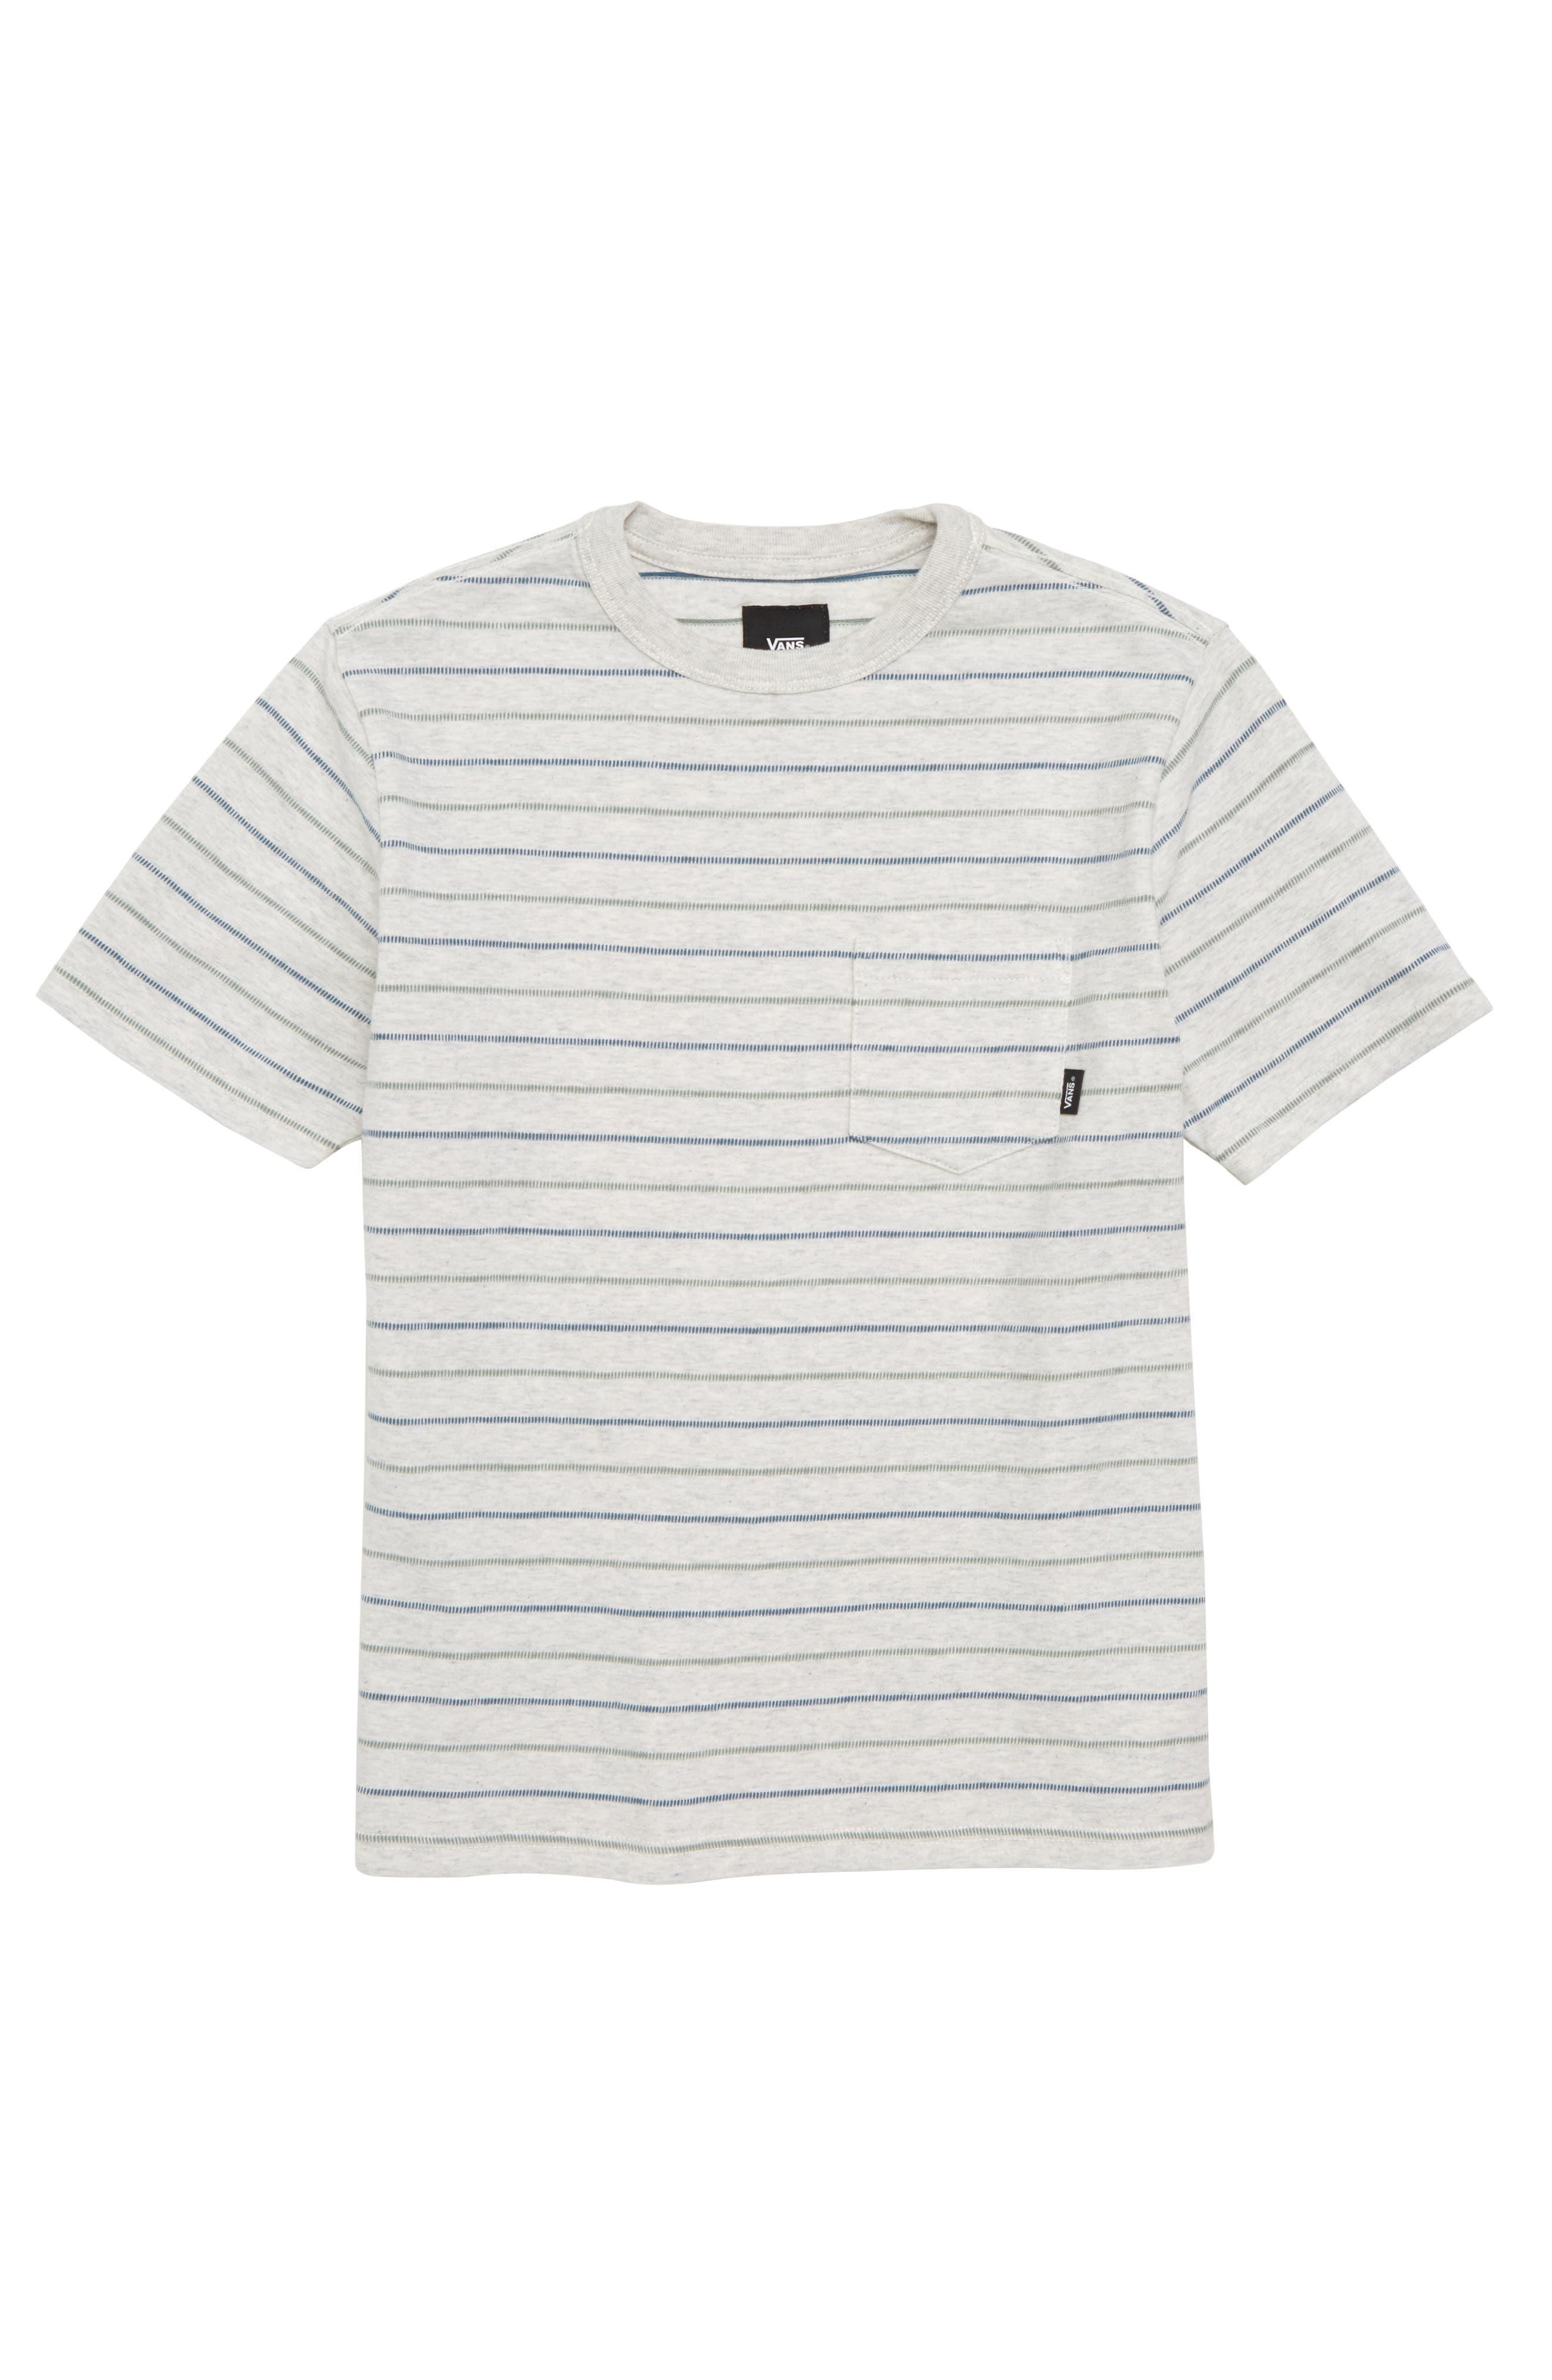 Strikemont III T-Shirt,                             Main thumbnail 1, color,                             030